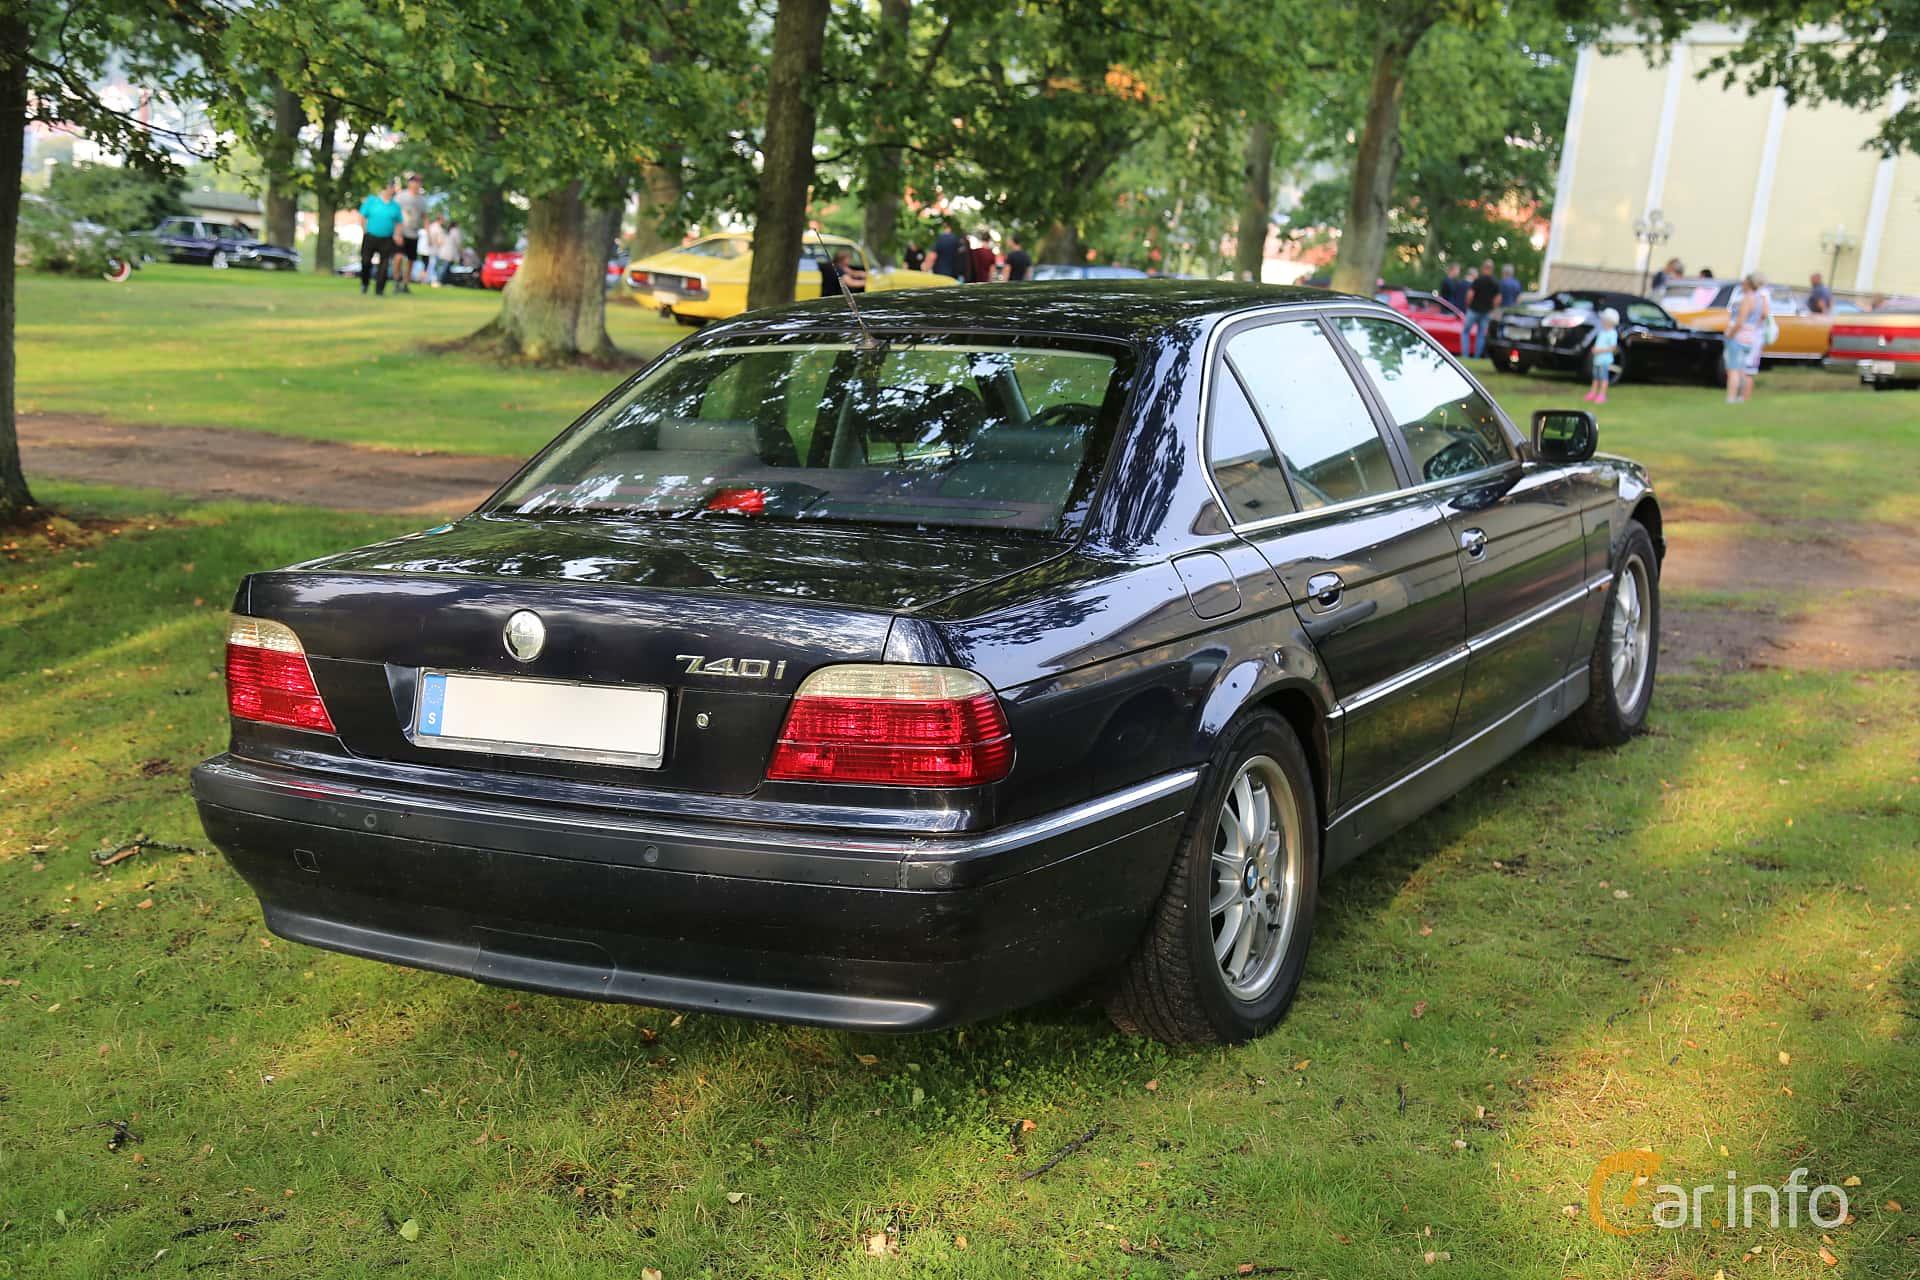 BMW 740i  Automatic, 286hp, 1995 at Bil & MC-träffar i Huskvarna Folkets Park 2019 Amerikanska fordon